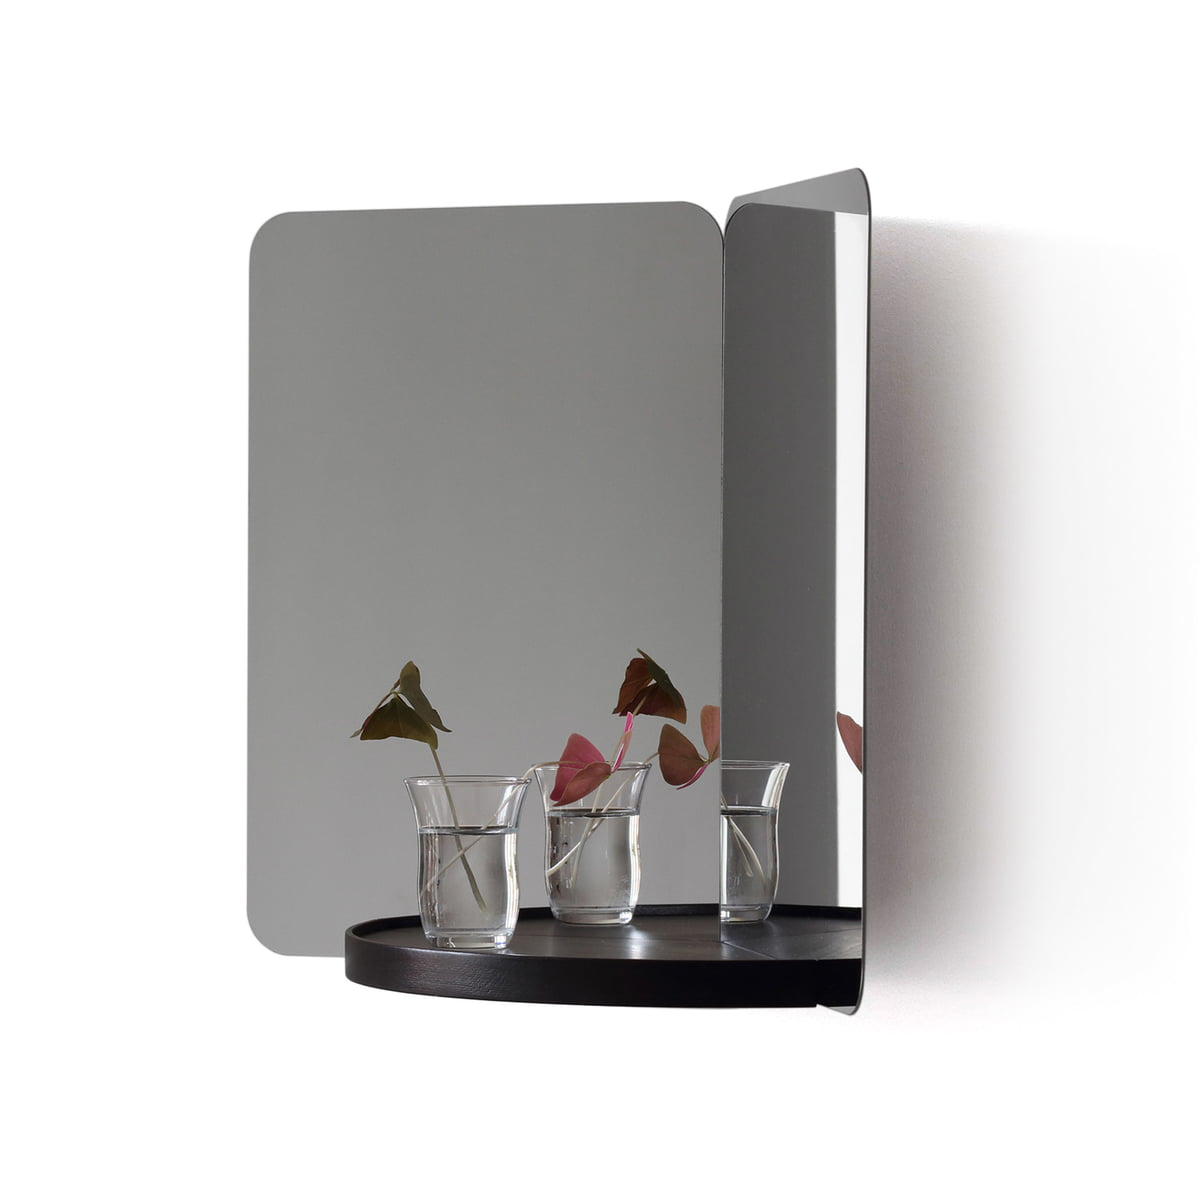 124 spiegel von artek. Black Bedroom Furniture Sets. Home Design Ideas